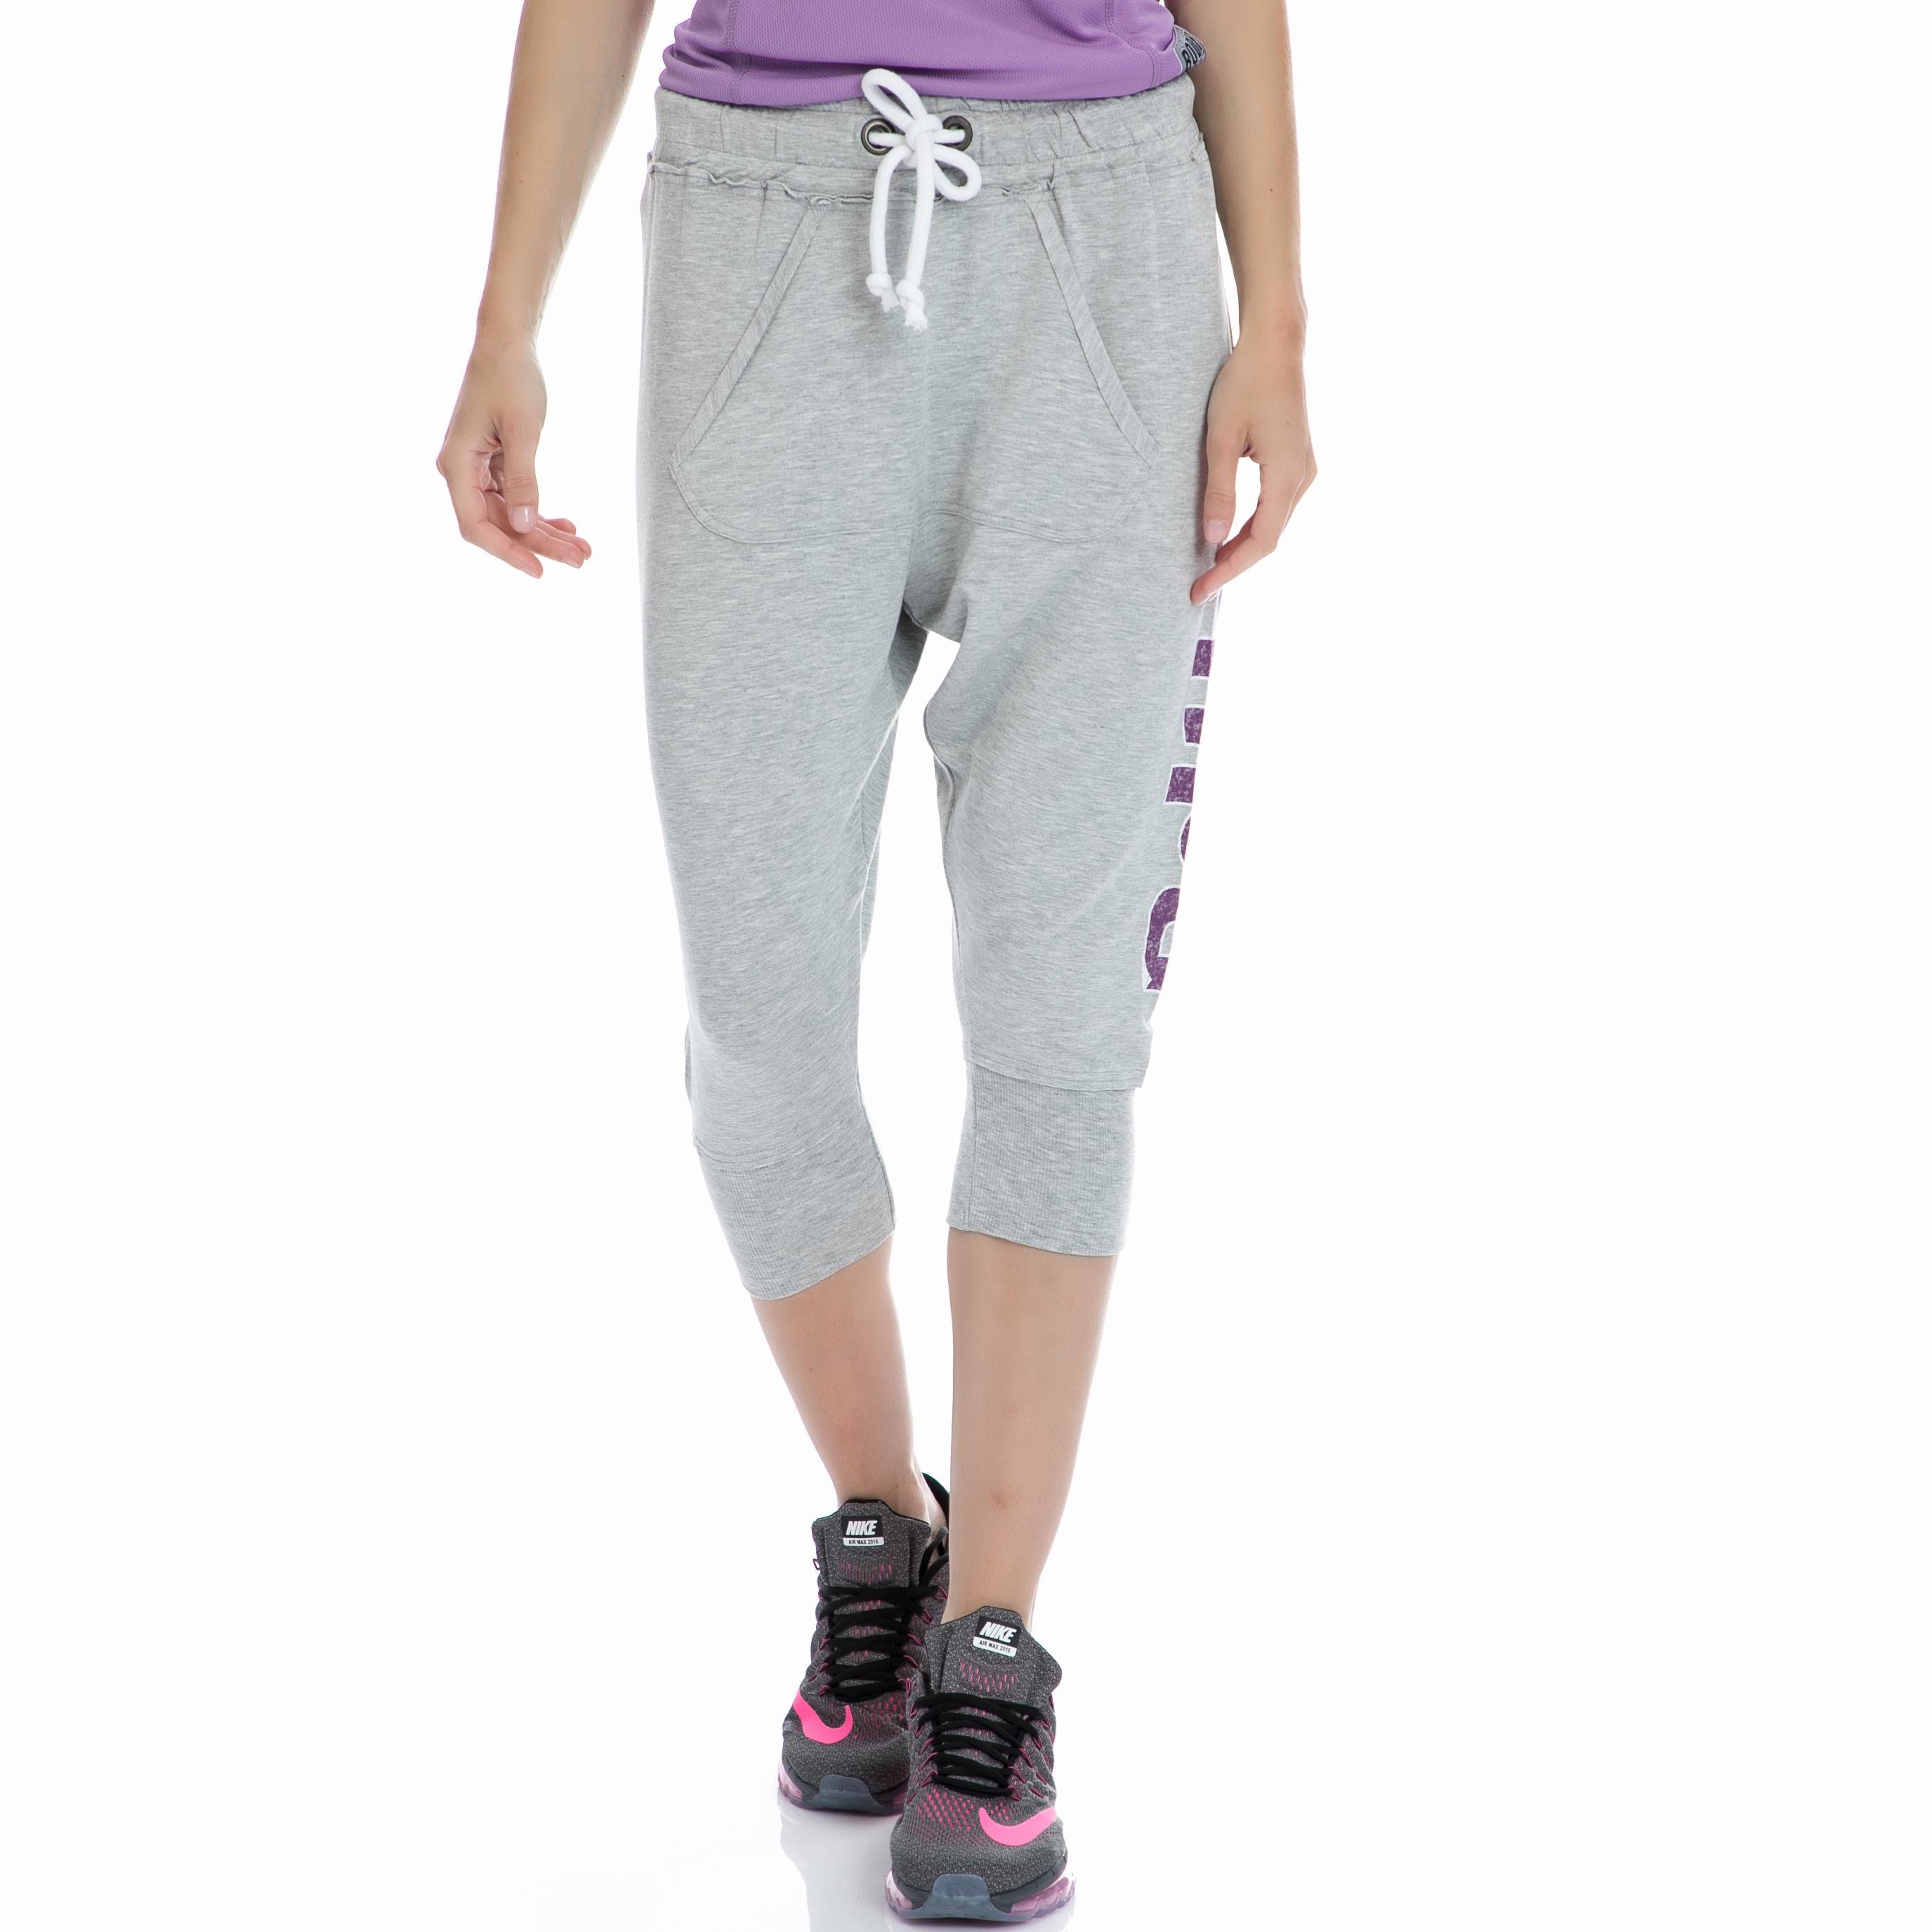 BODYTALK - Γυναικείο παντελόνι BODYTALK γκρι γυναικεία ρούχα αθλητικά φόρμες